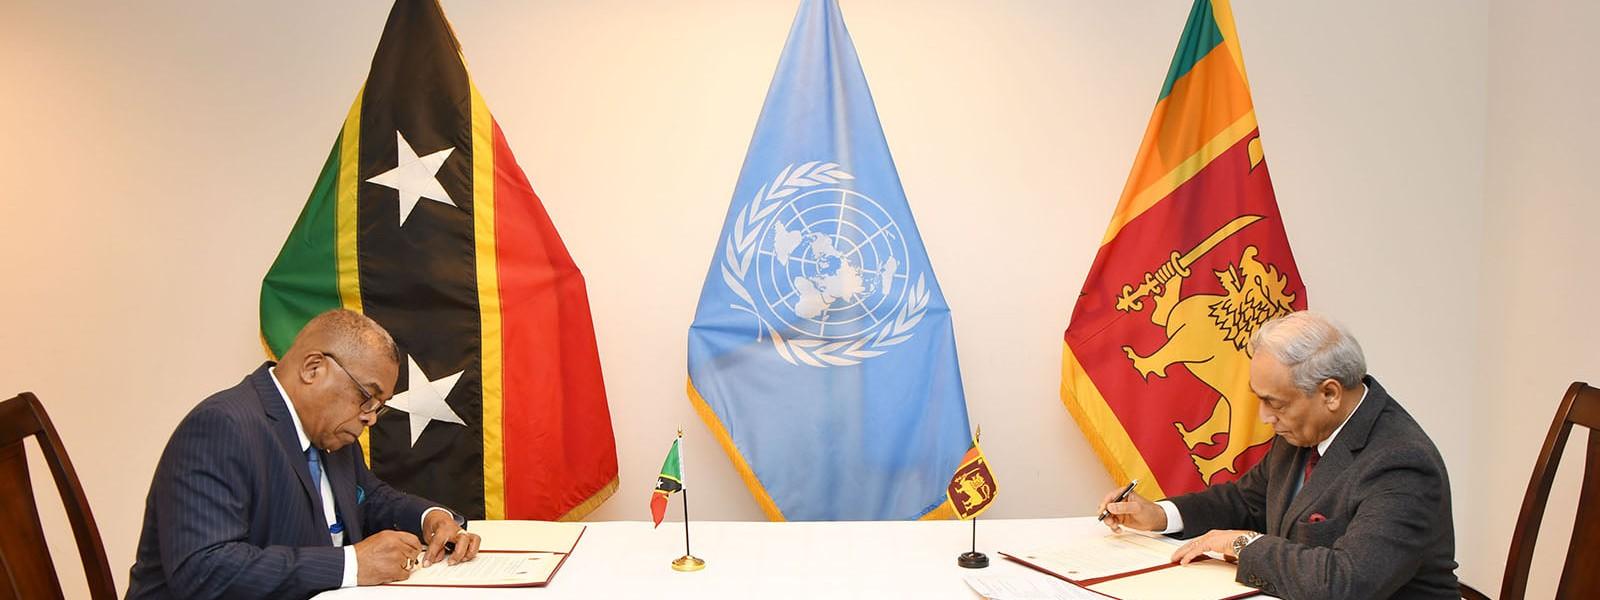 Sri Lanka establishes diplomatic relations with Saint Kitts and Nevis